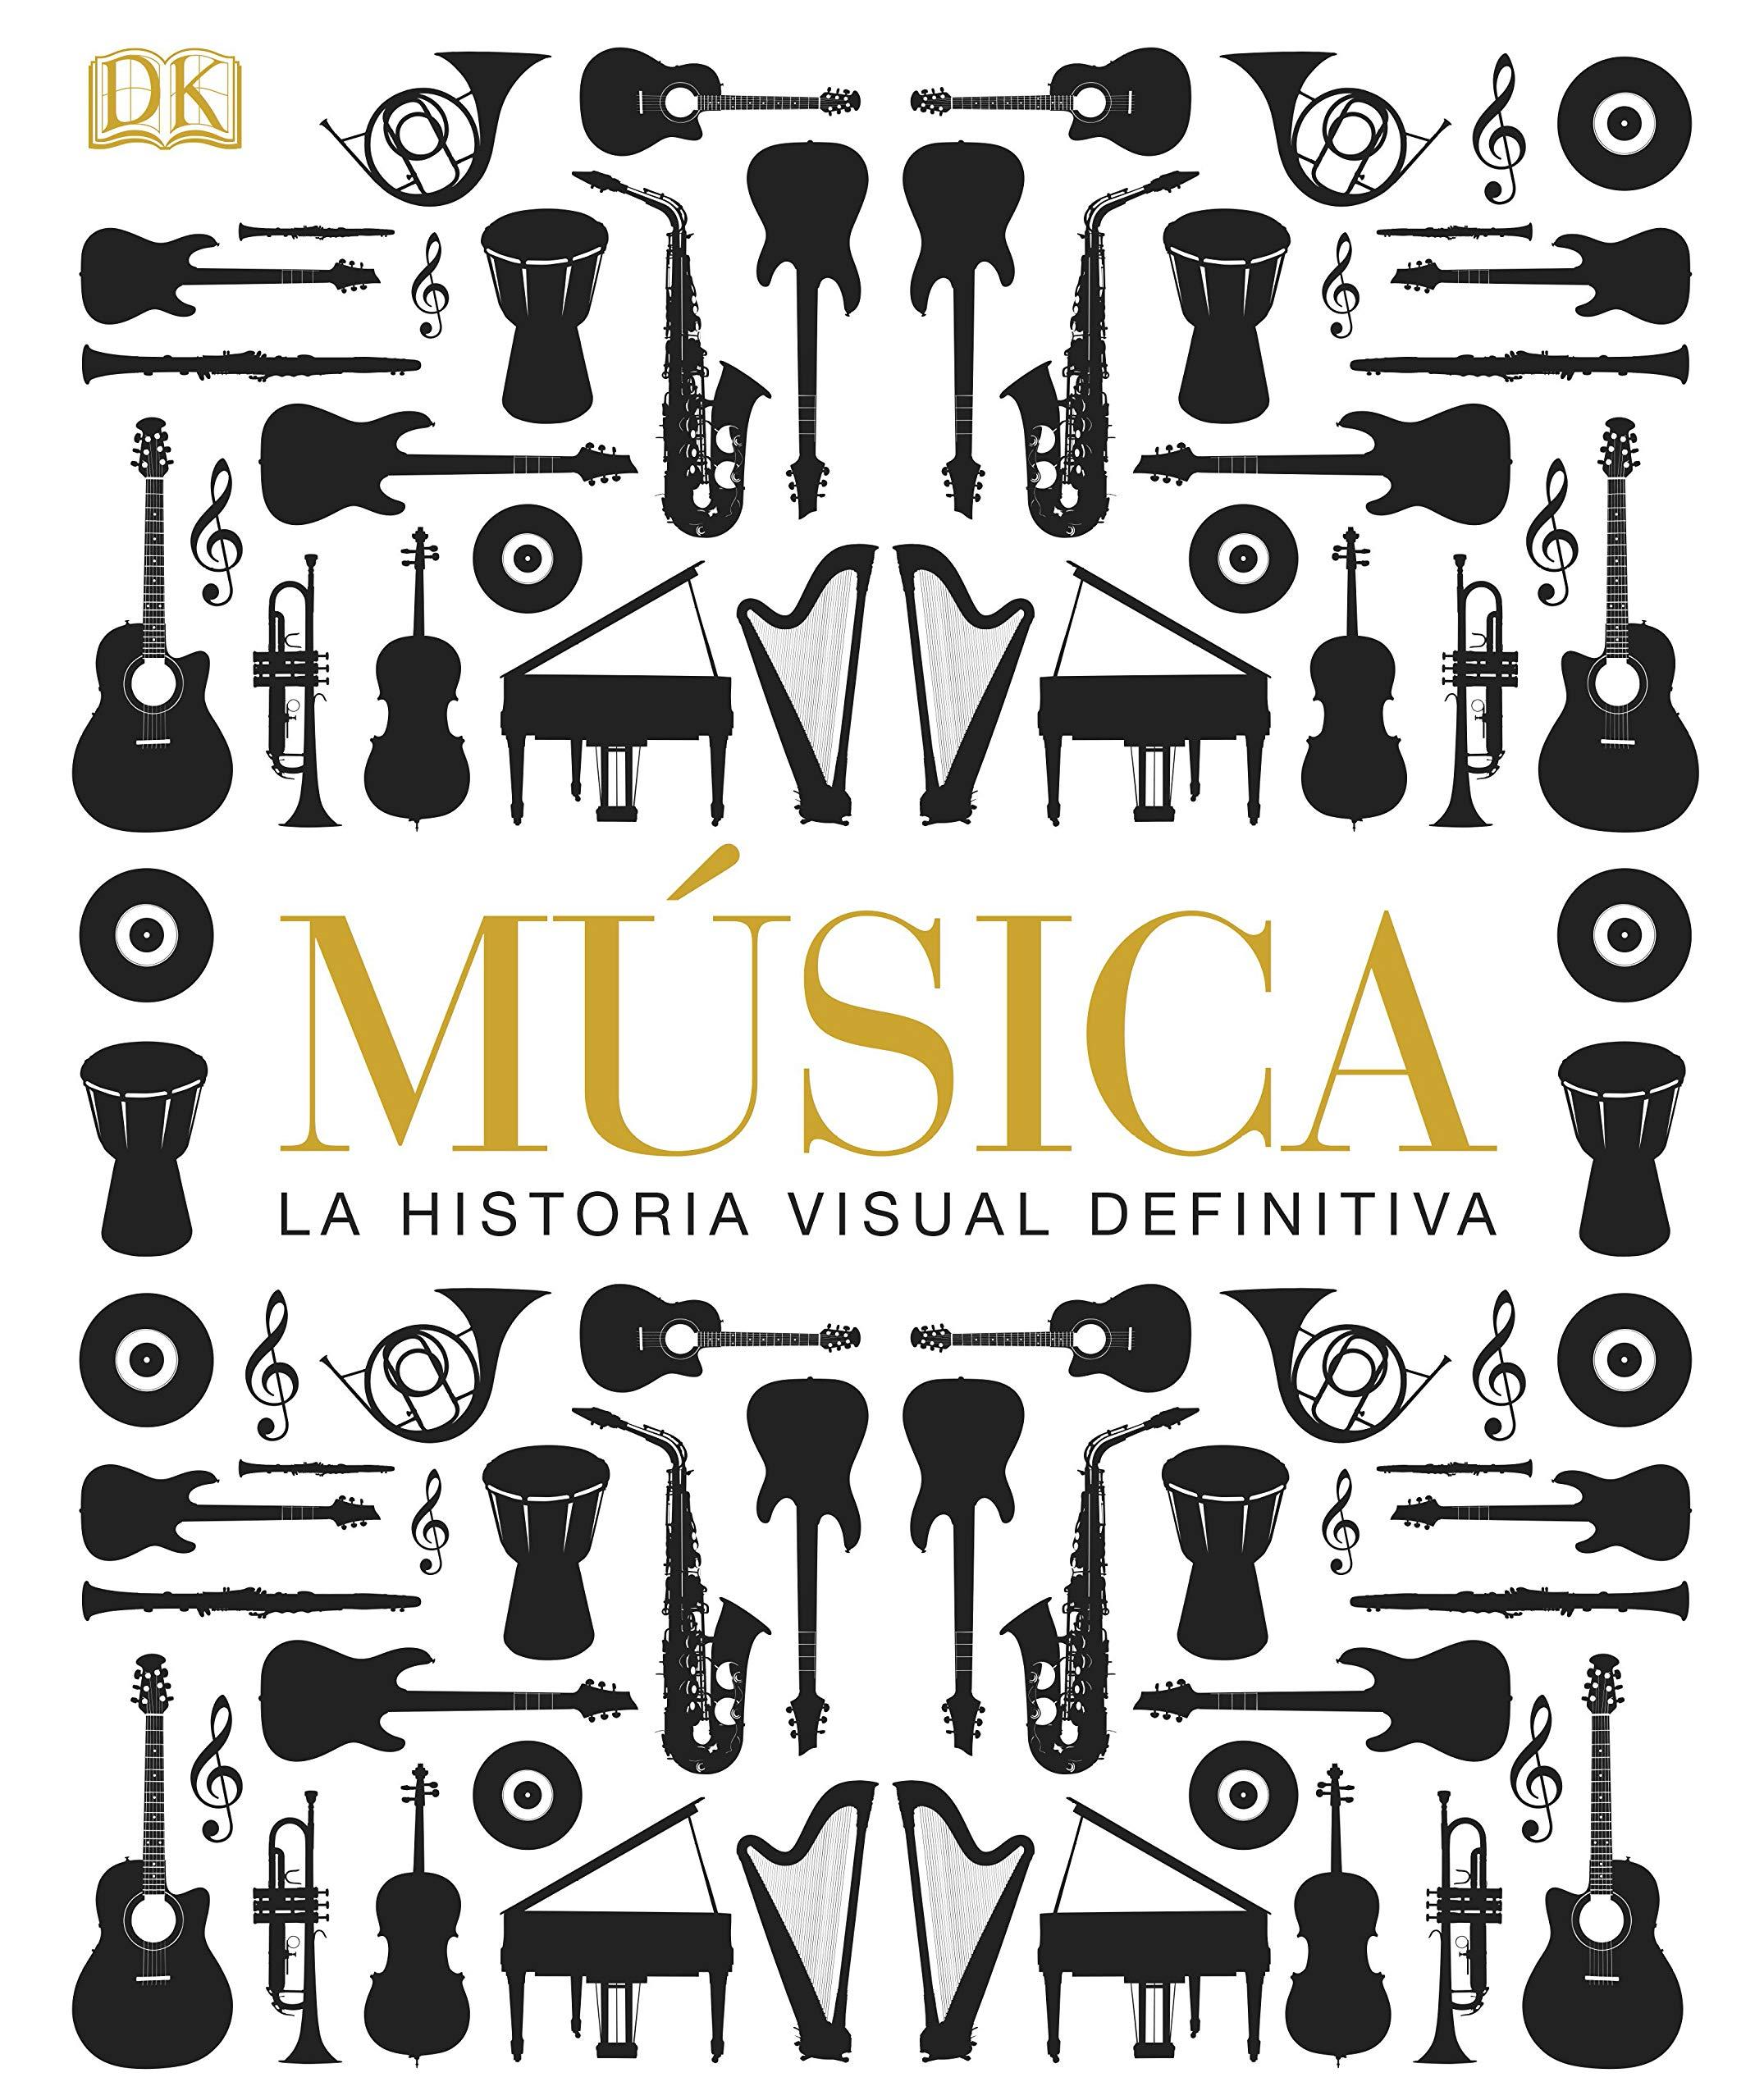 Música (DK) (Spanish) Paperback – 2014